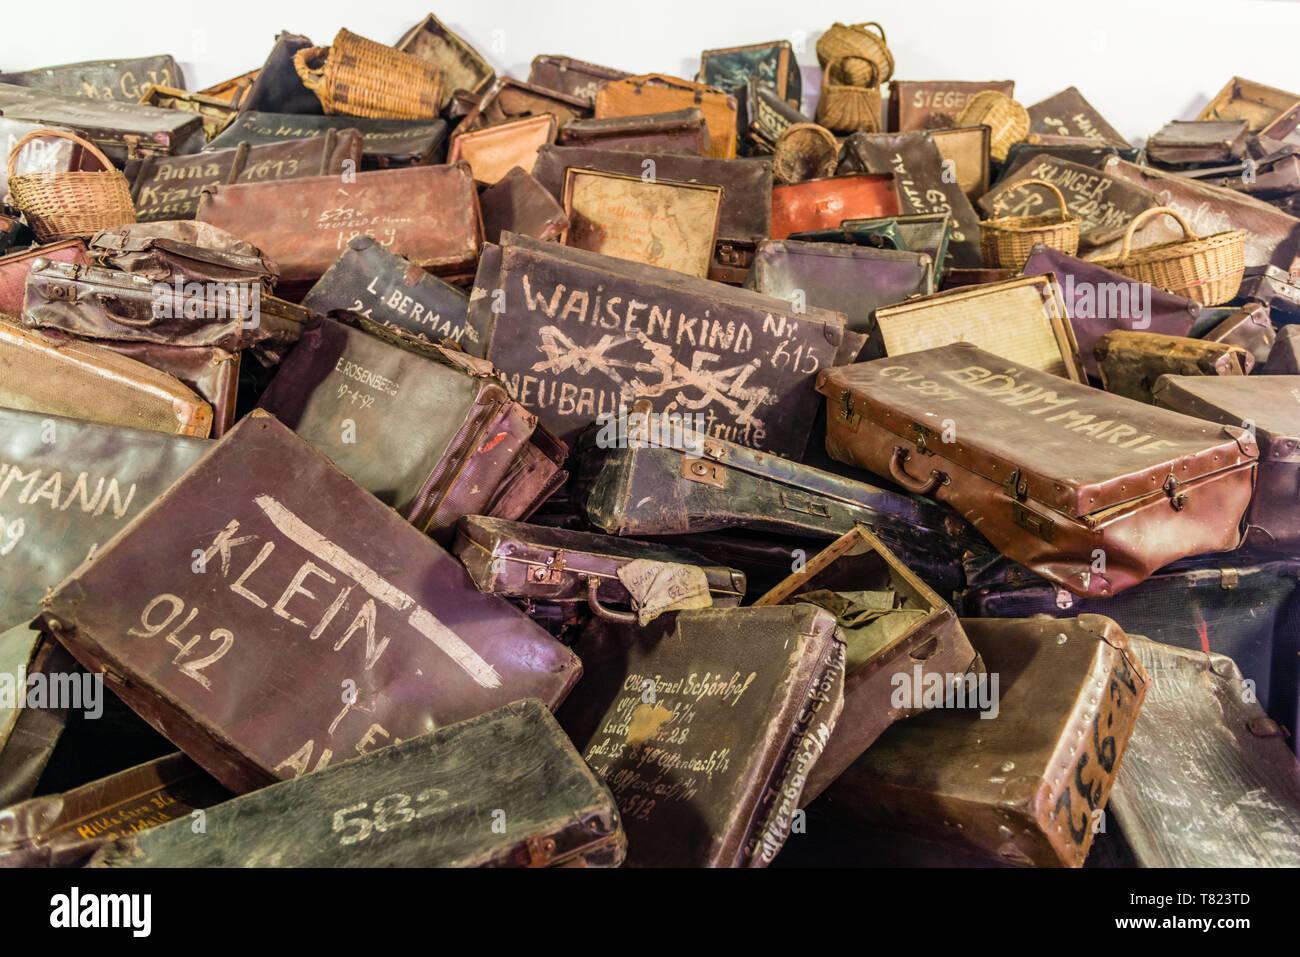 AUSCHWITZ (OSWIECIM), POLAND - APRIL 18, 2019: Suitcases of victims in Auschwitz I (main camp) in Oswiecim, Poland - Stock Image